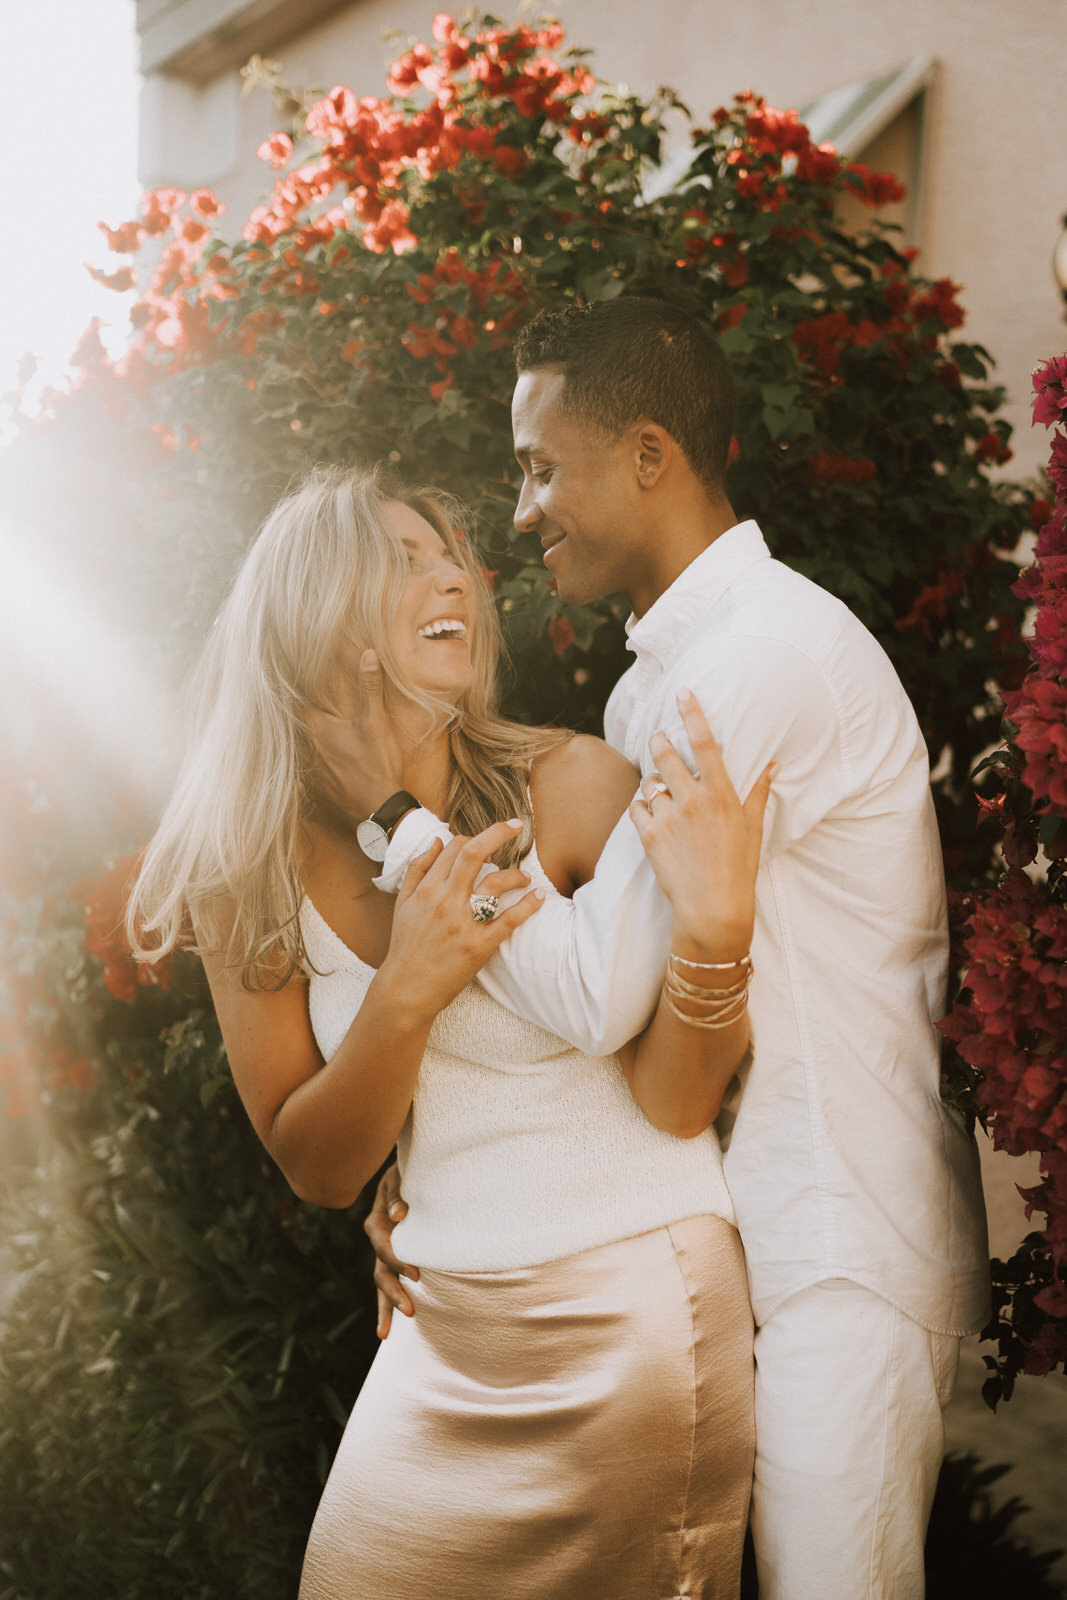 Naples 5th Ave Engagement Photos- Michelle Gonzalez Photography- Michele + Troy-182.JPG